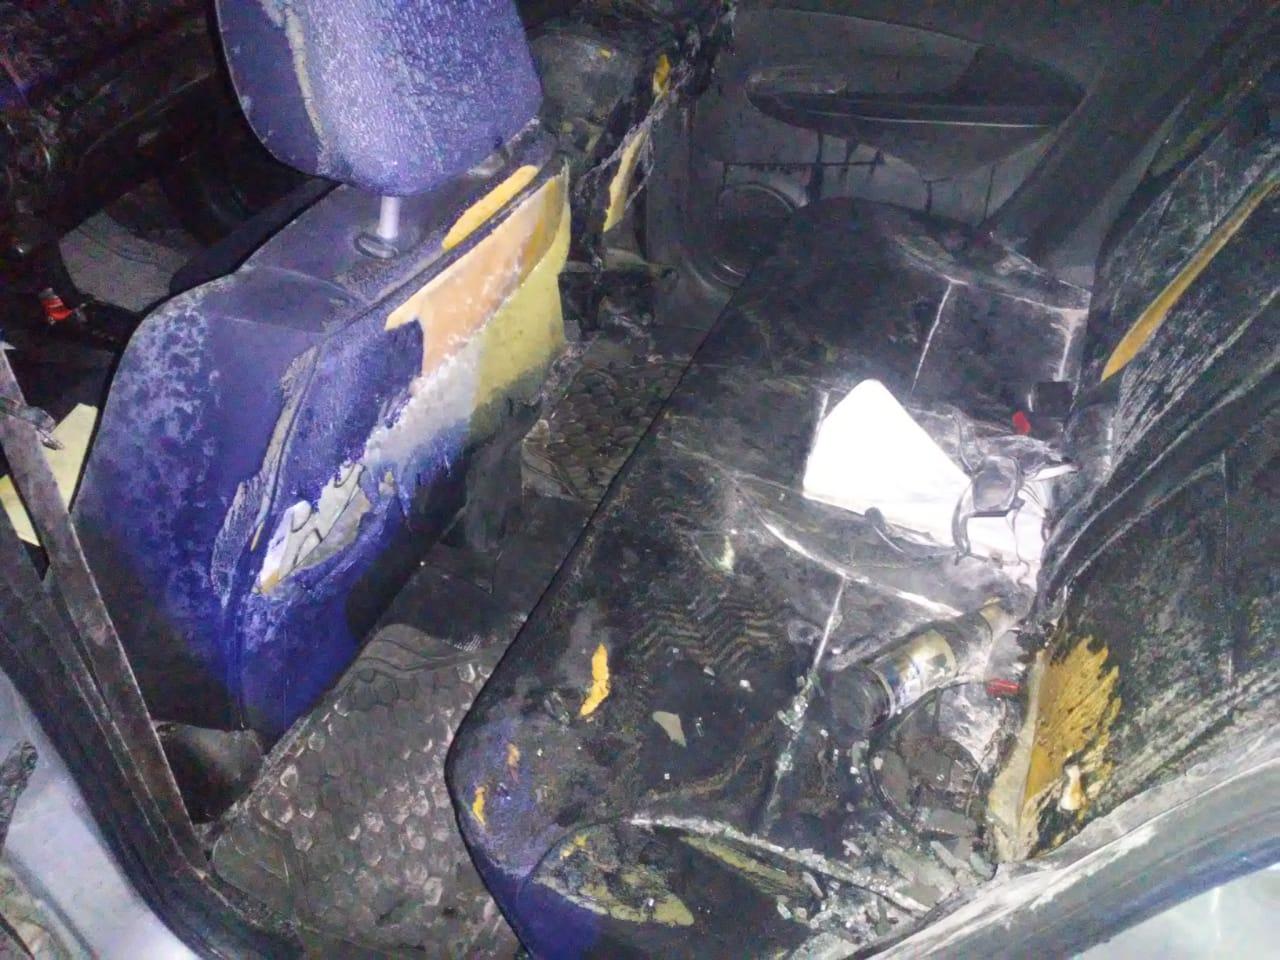 Incendian vehículo con bomba molotov